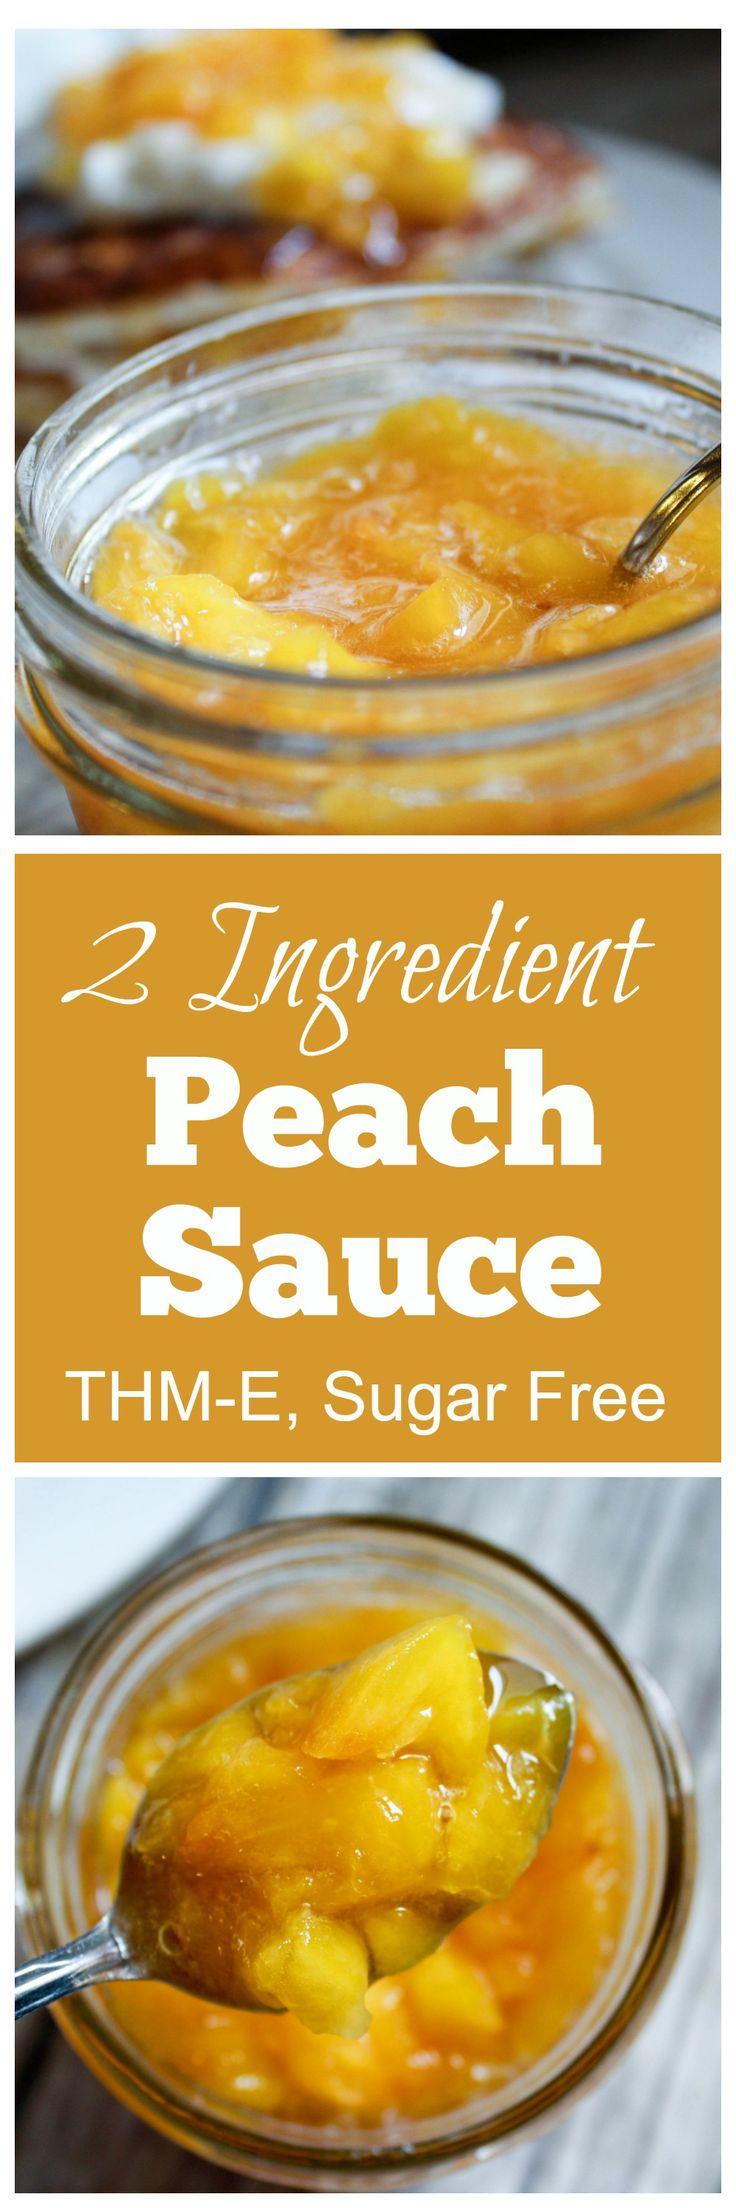 2 Ingredient Peach Sauce {THM-E, Sugar Free, Low Fat}